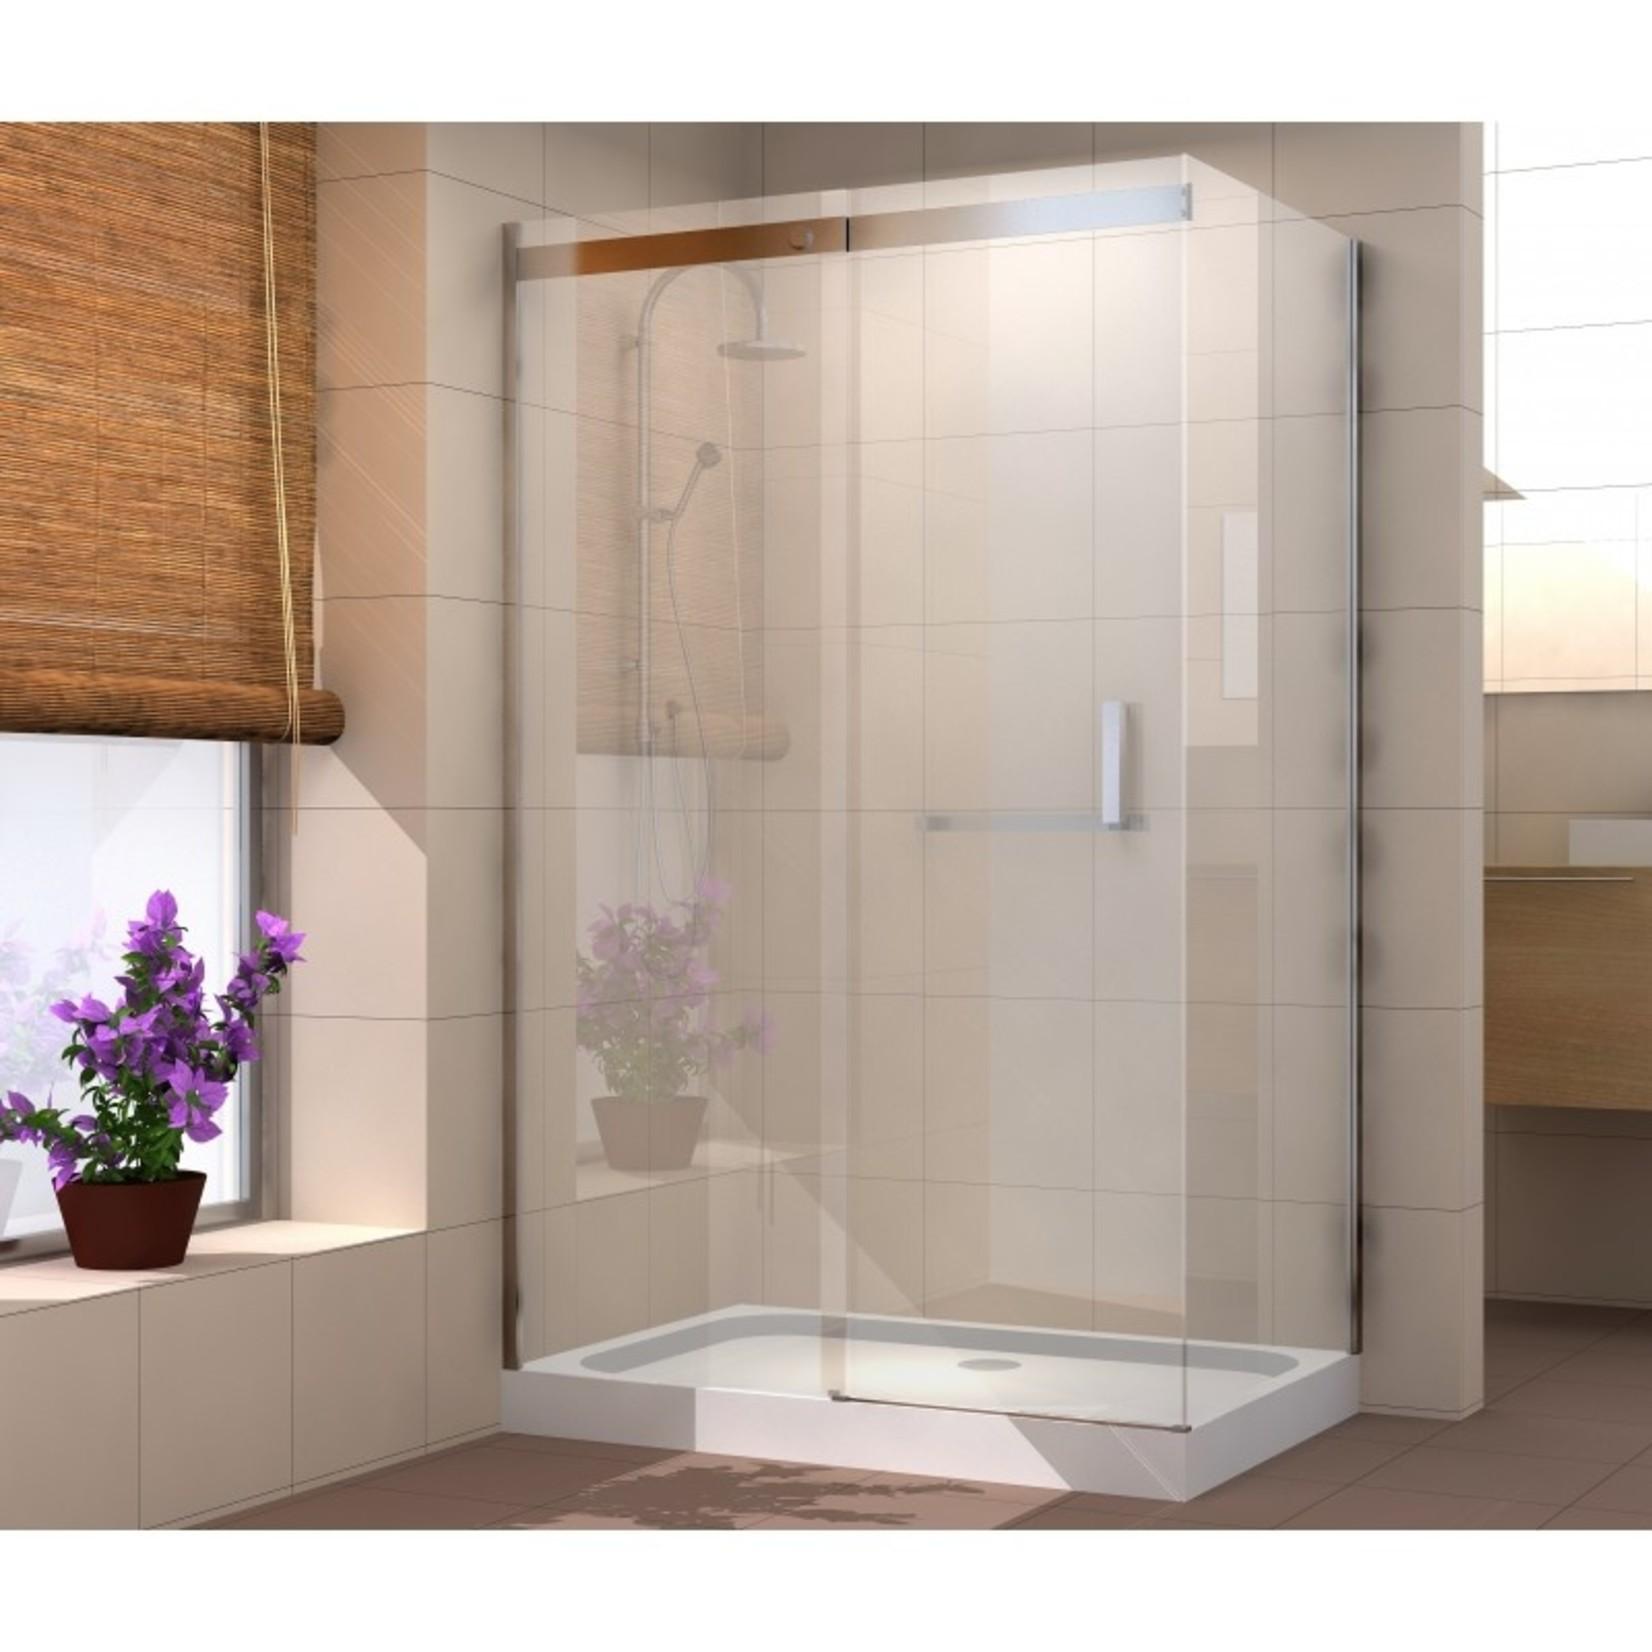 36x60 brushed nickel shower set quartz ocea series